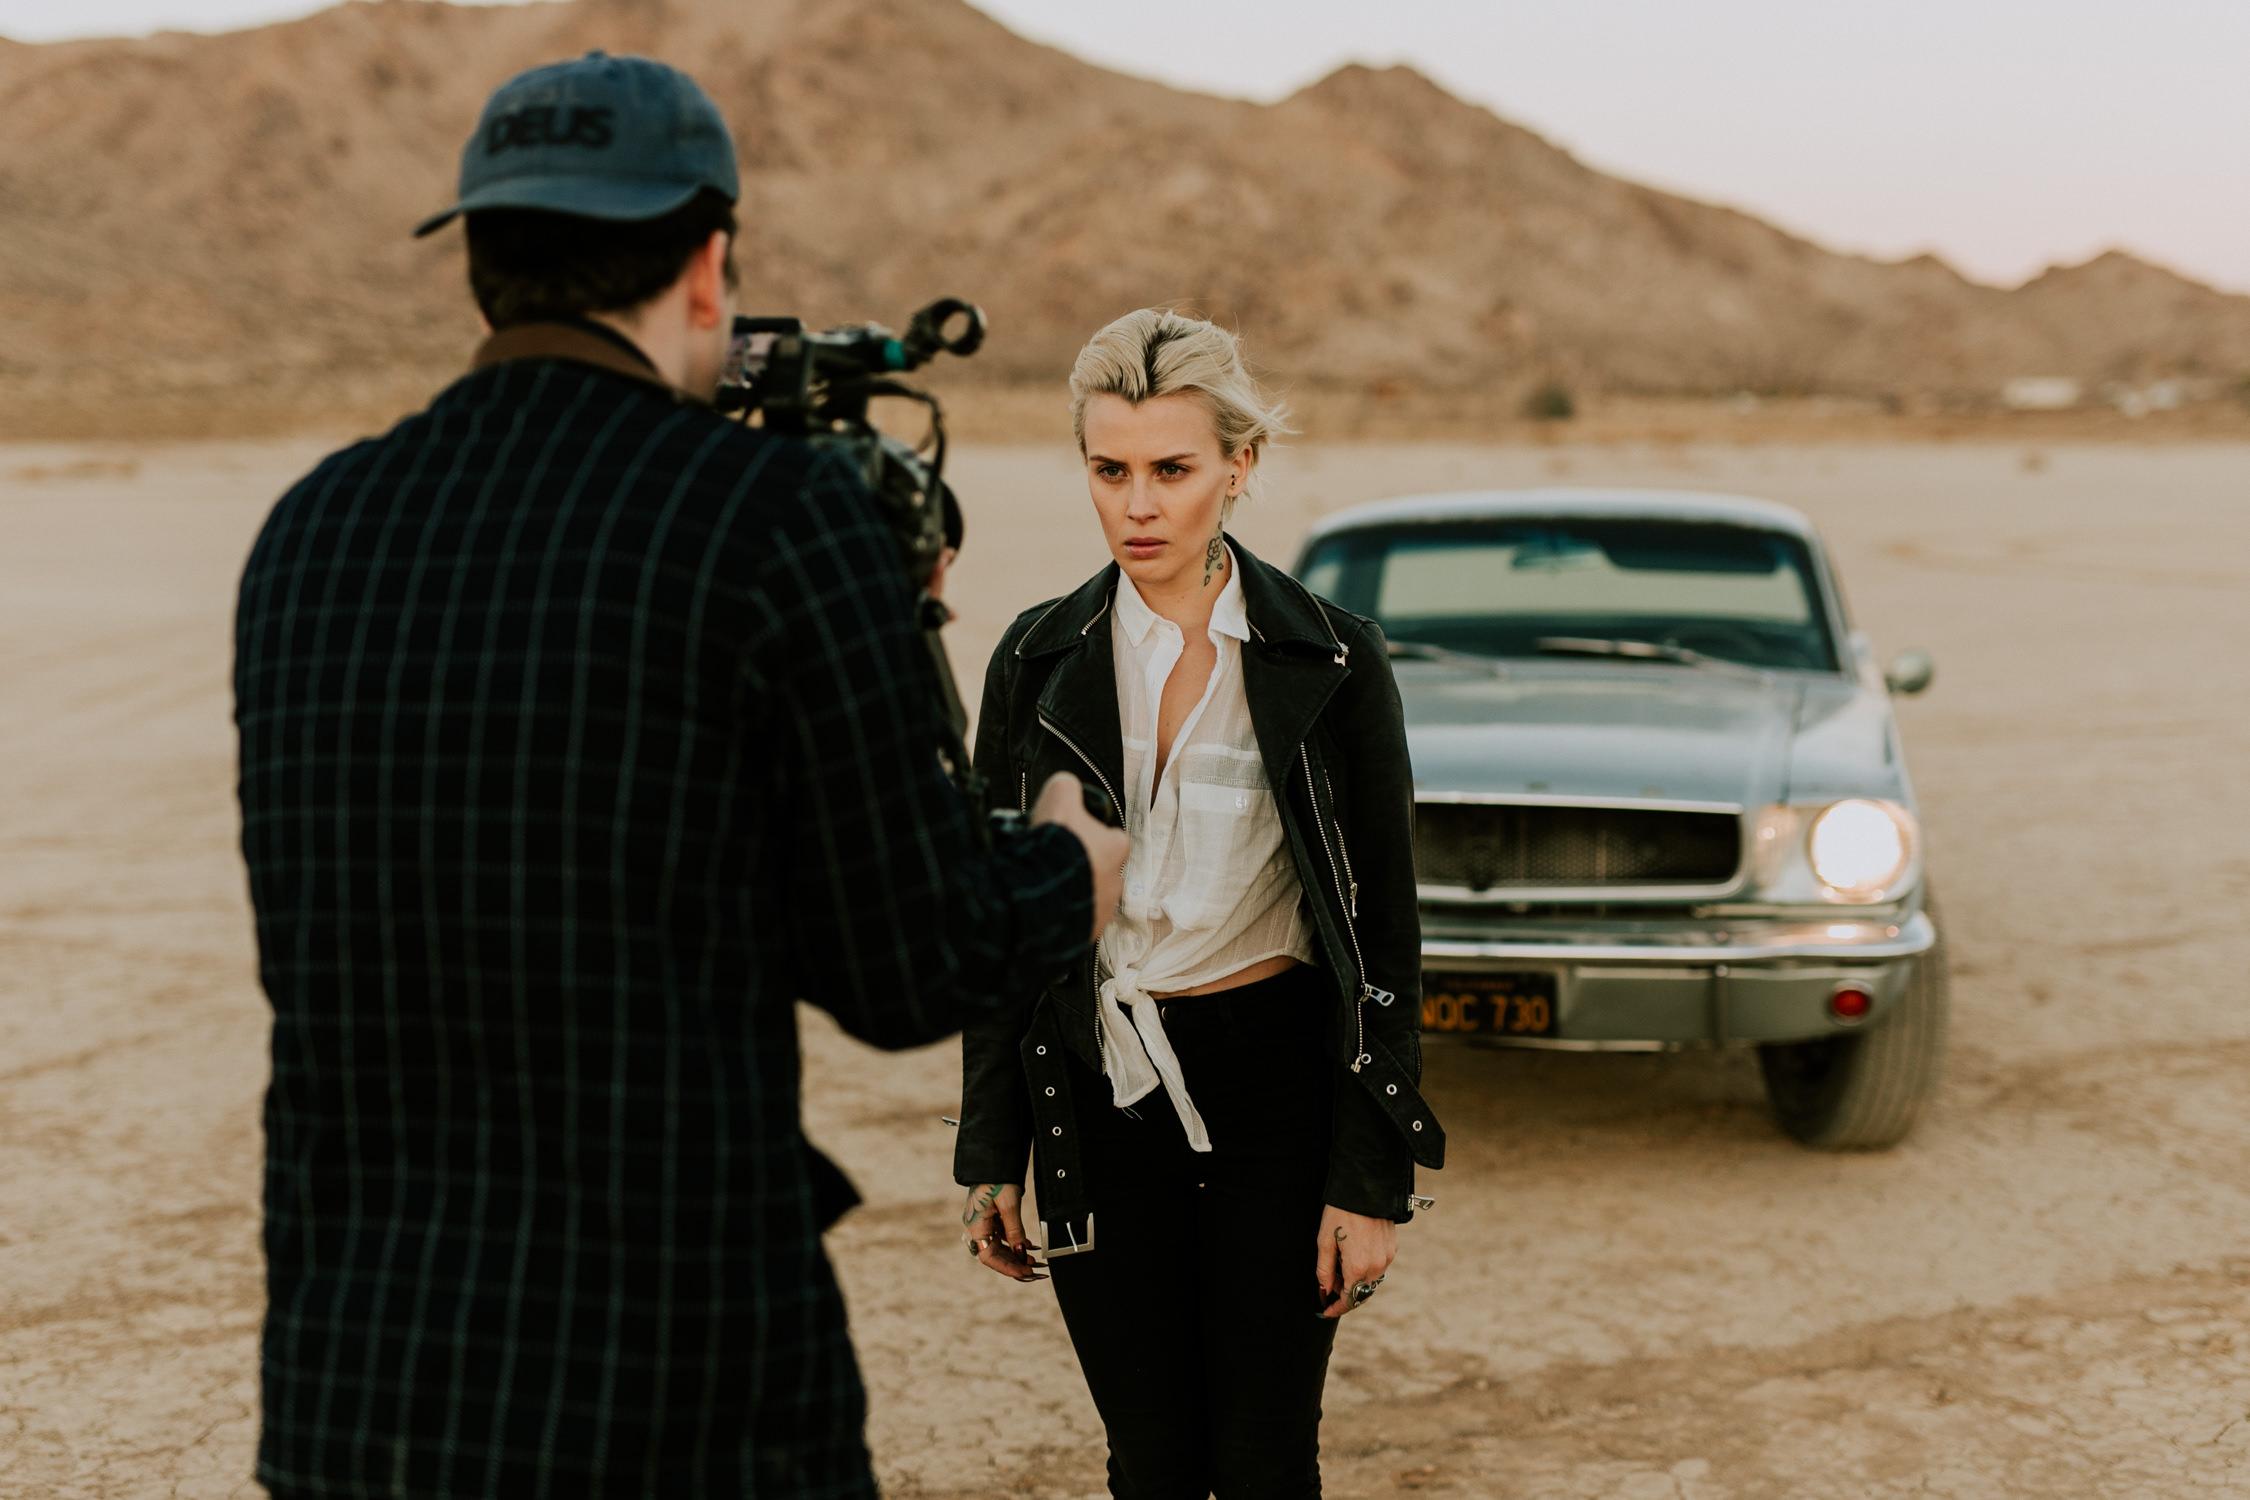 silverstein-music-video-behind-the-scenes-desert-classic-car-AnnaLeeMedia